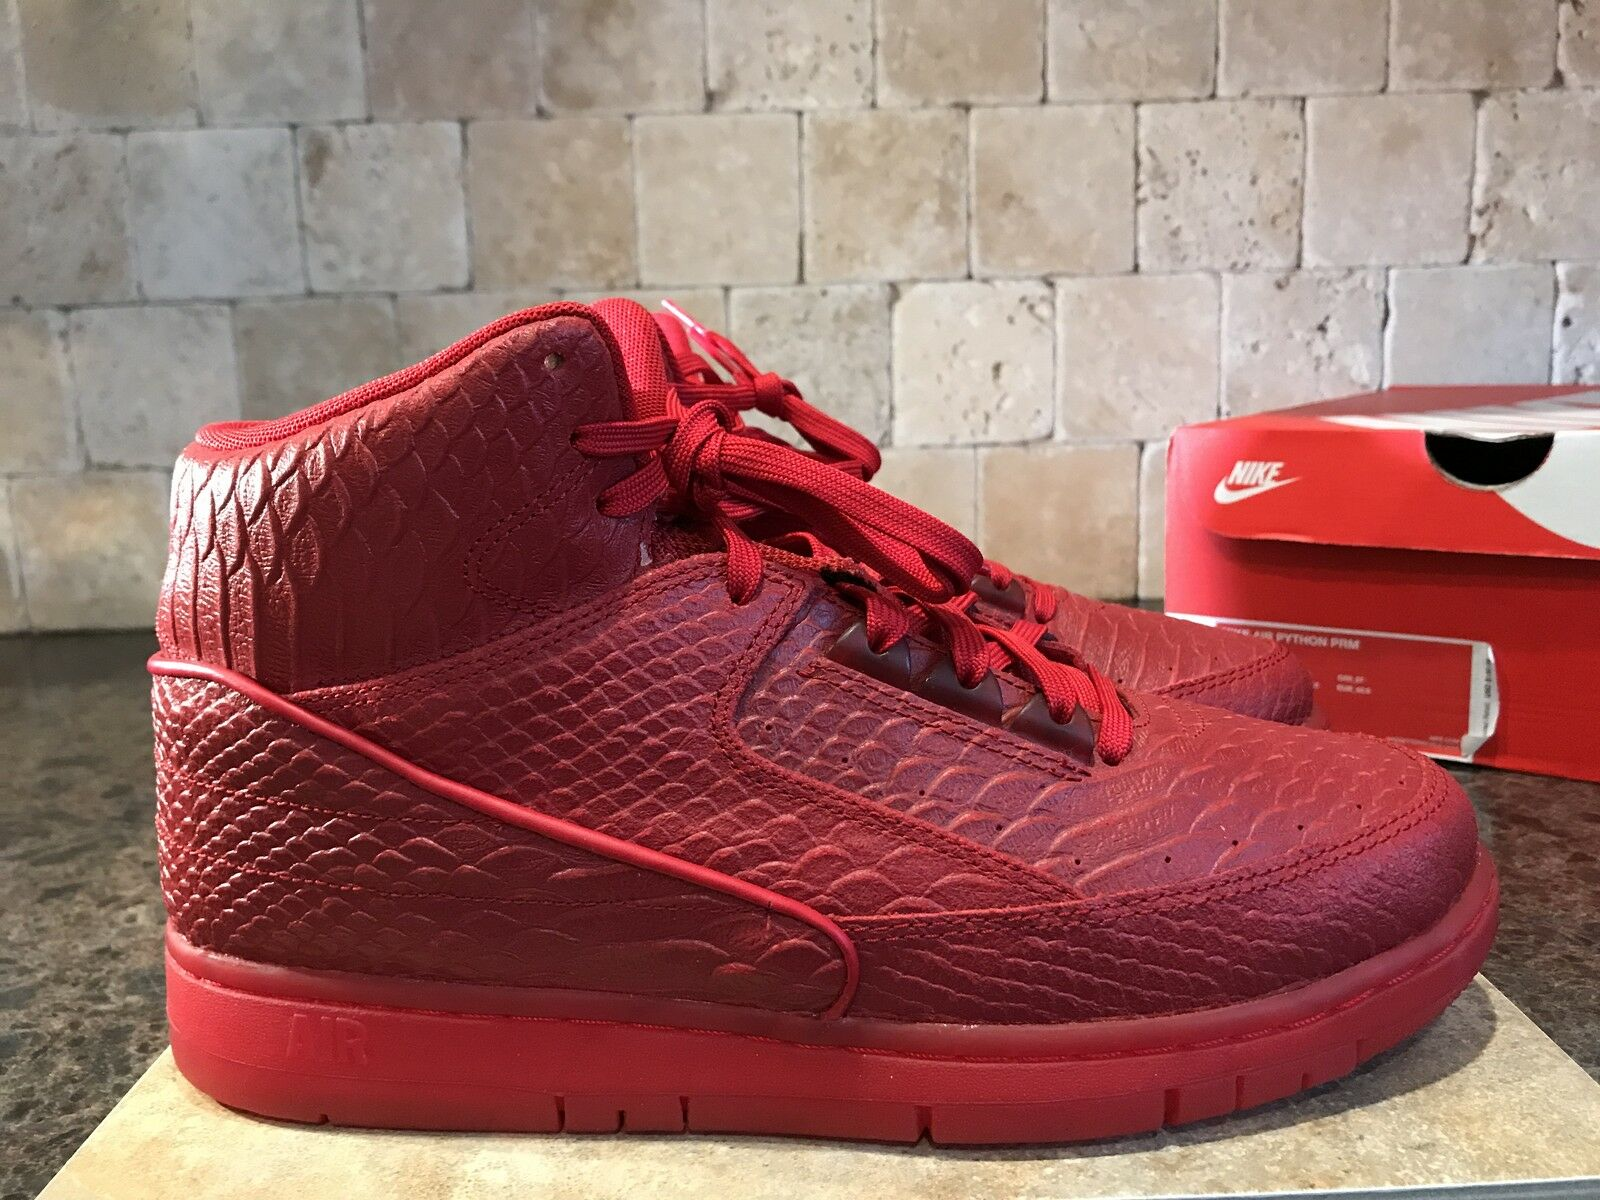 nike air jordan spike lee quarante pe basketball les chaussures nouvelles chaussures les 807541-002 taille 11,5 fa6404